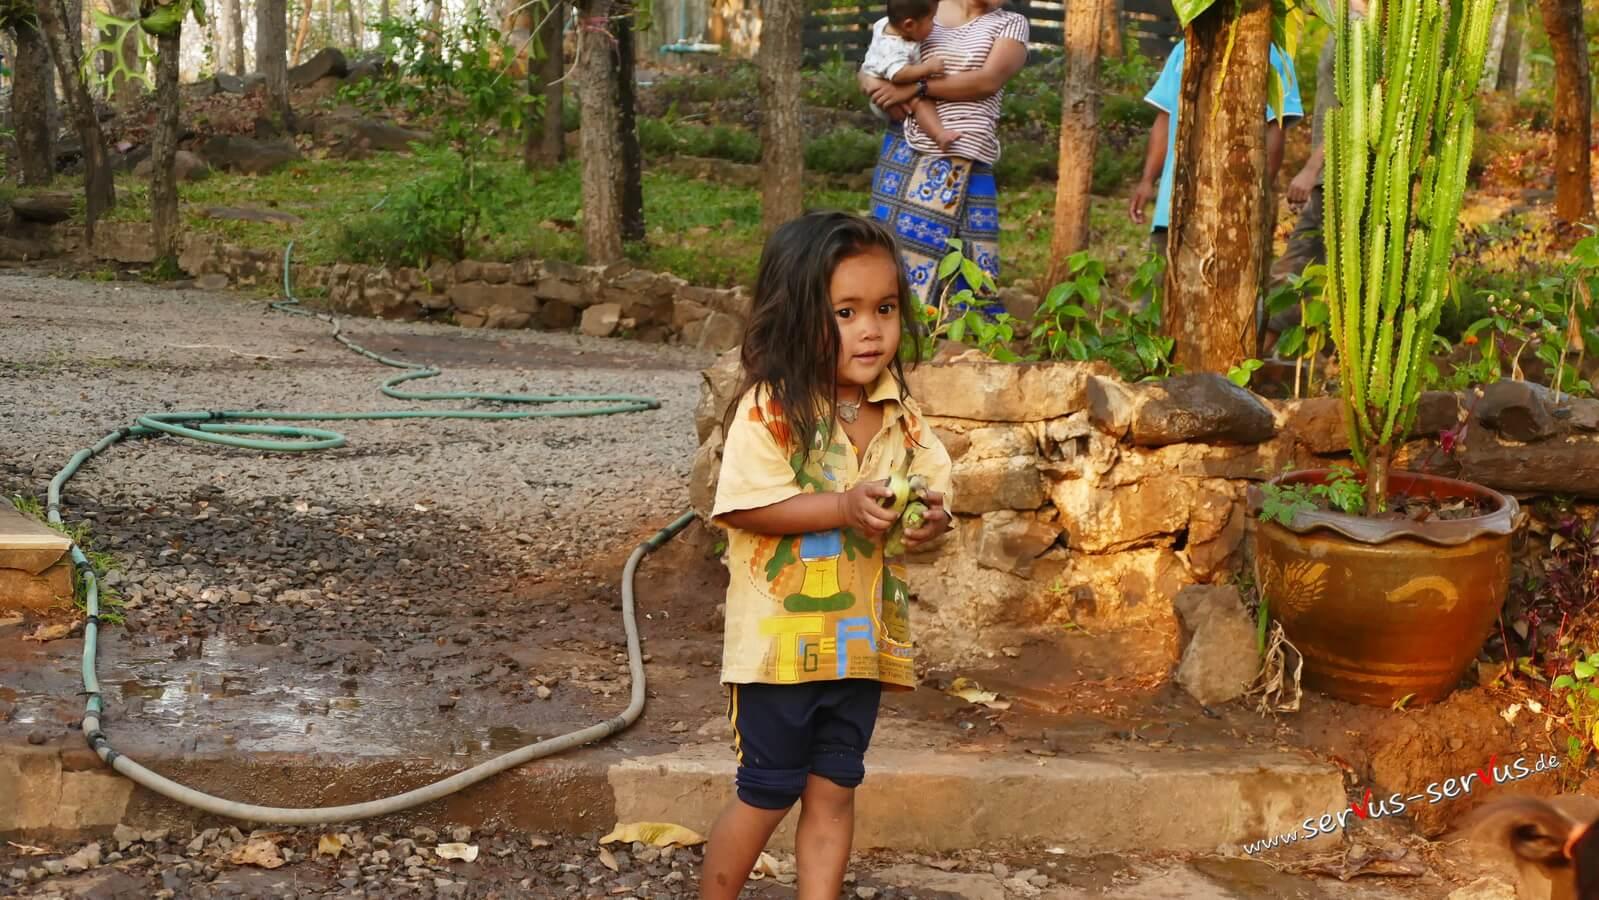 Dorfkinder in Laos, Tad Lo, Bolavenplateau